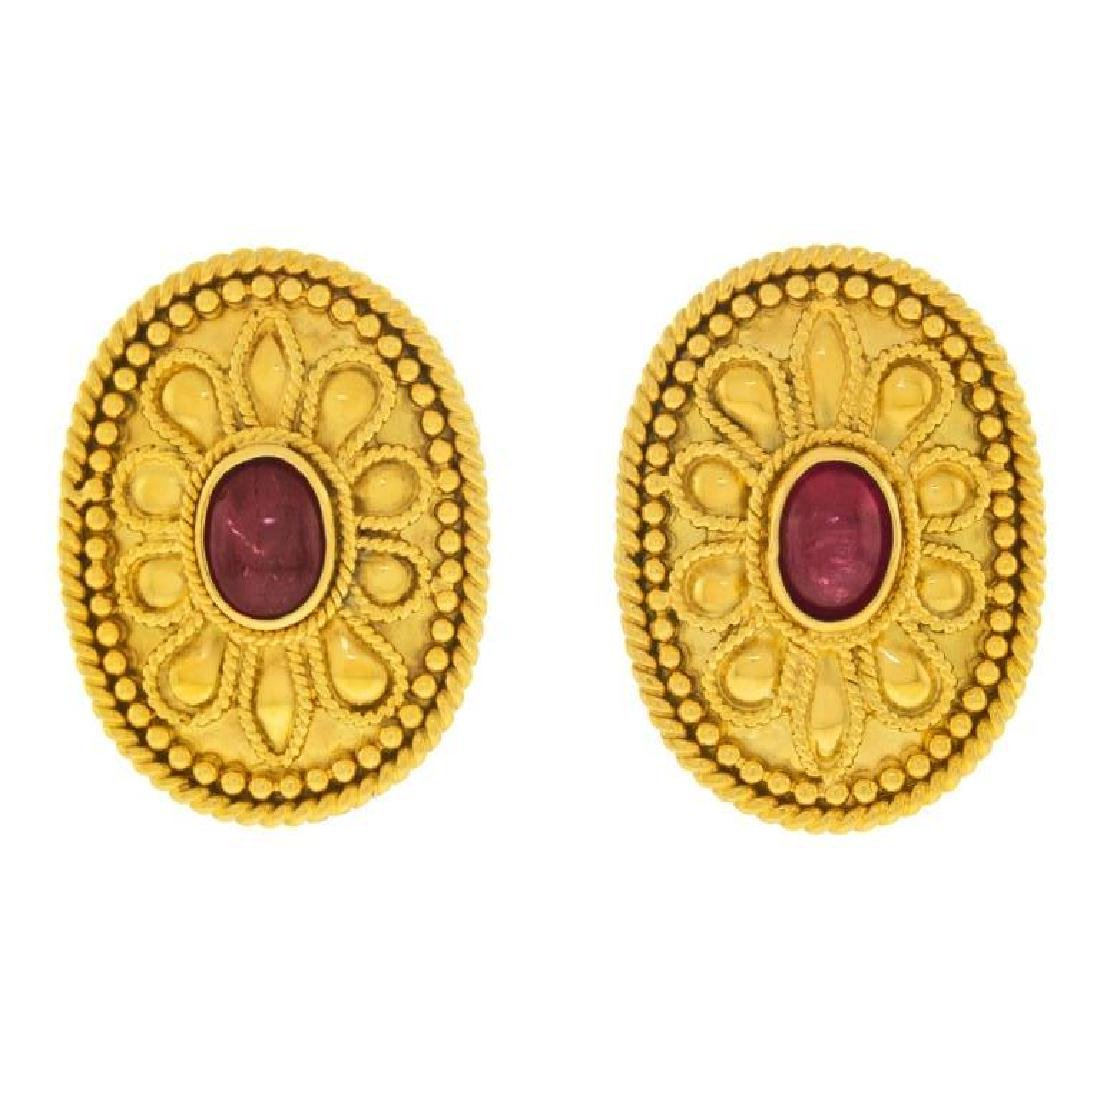 Archaic Motif 18k and Ruby Earrings